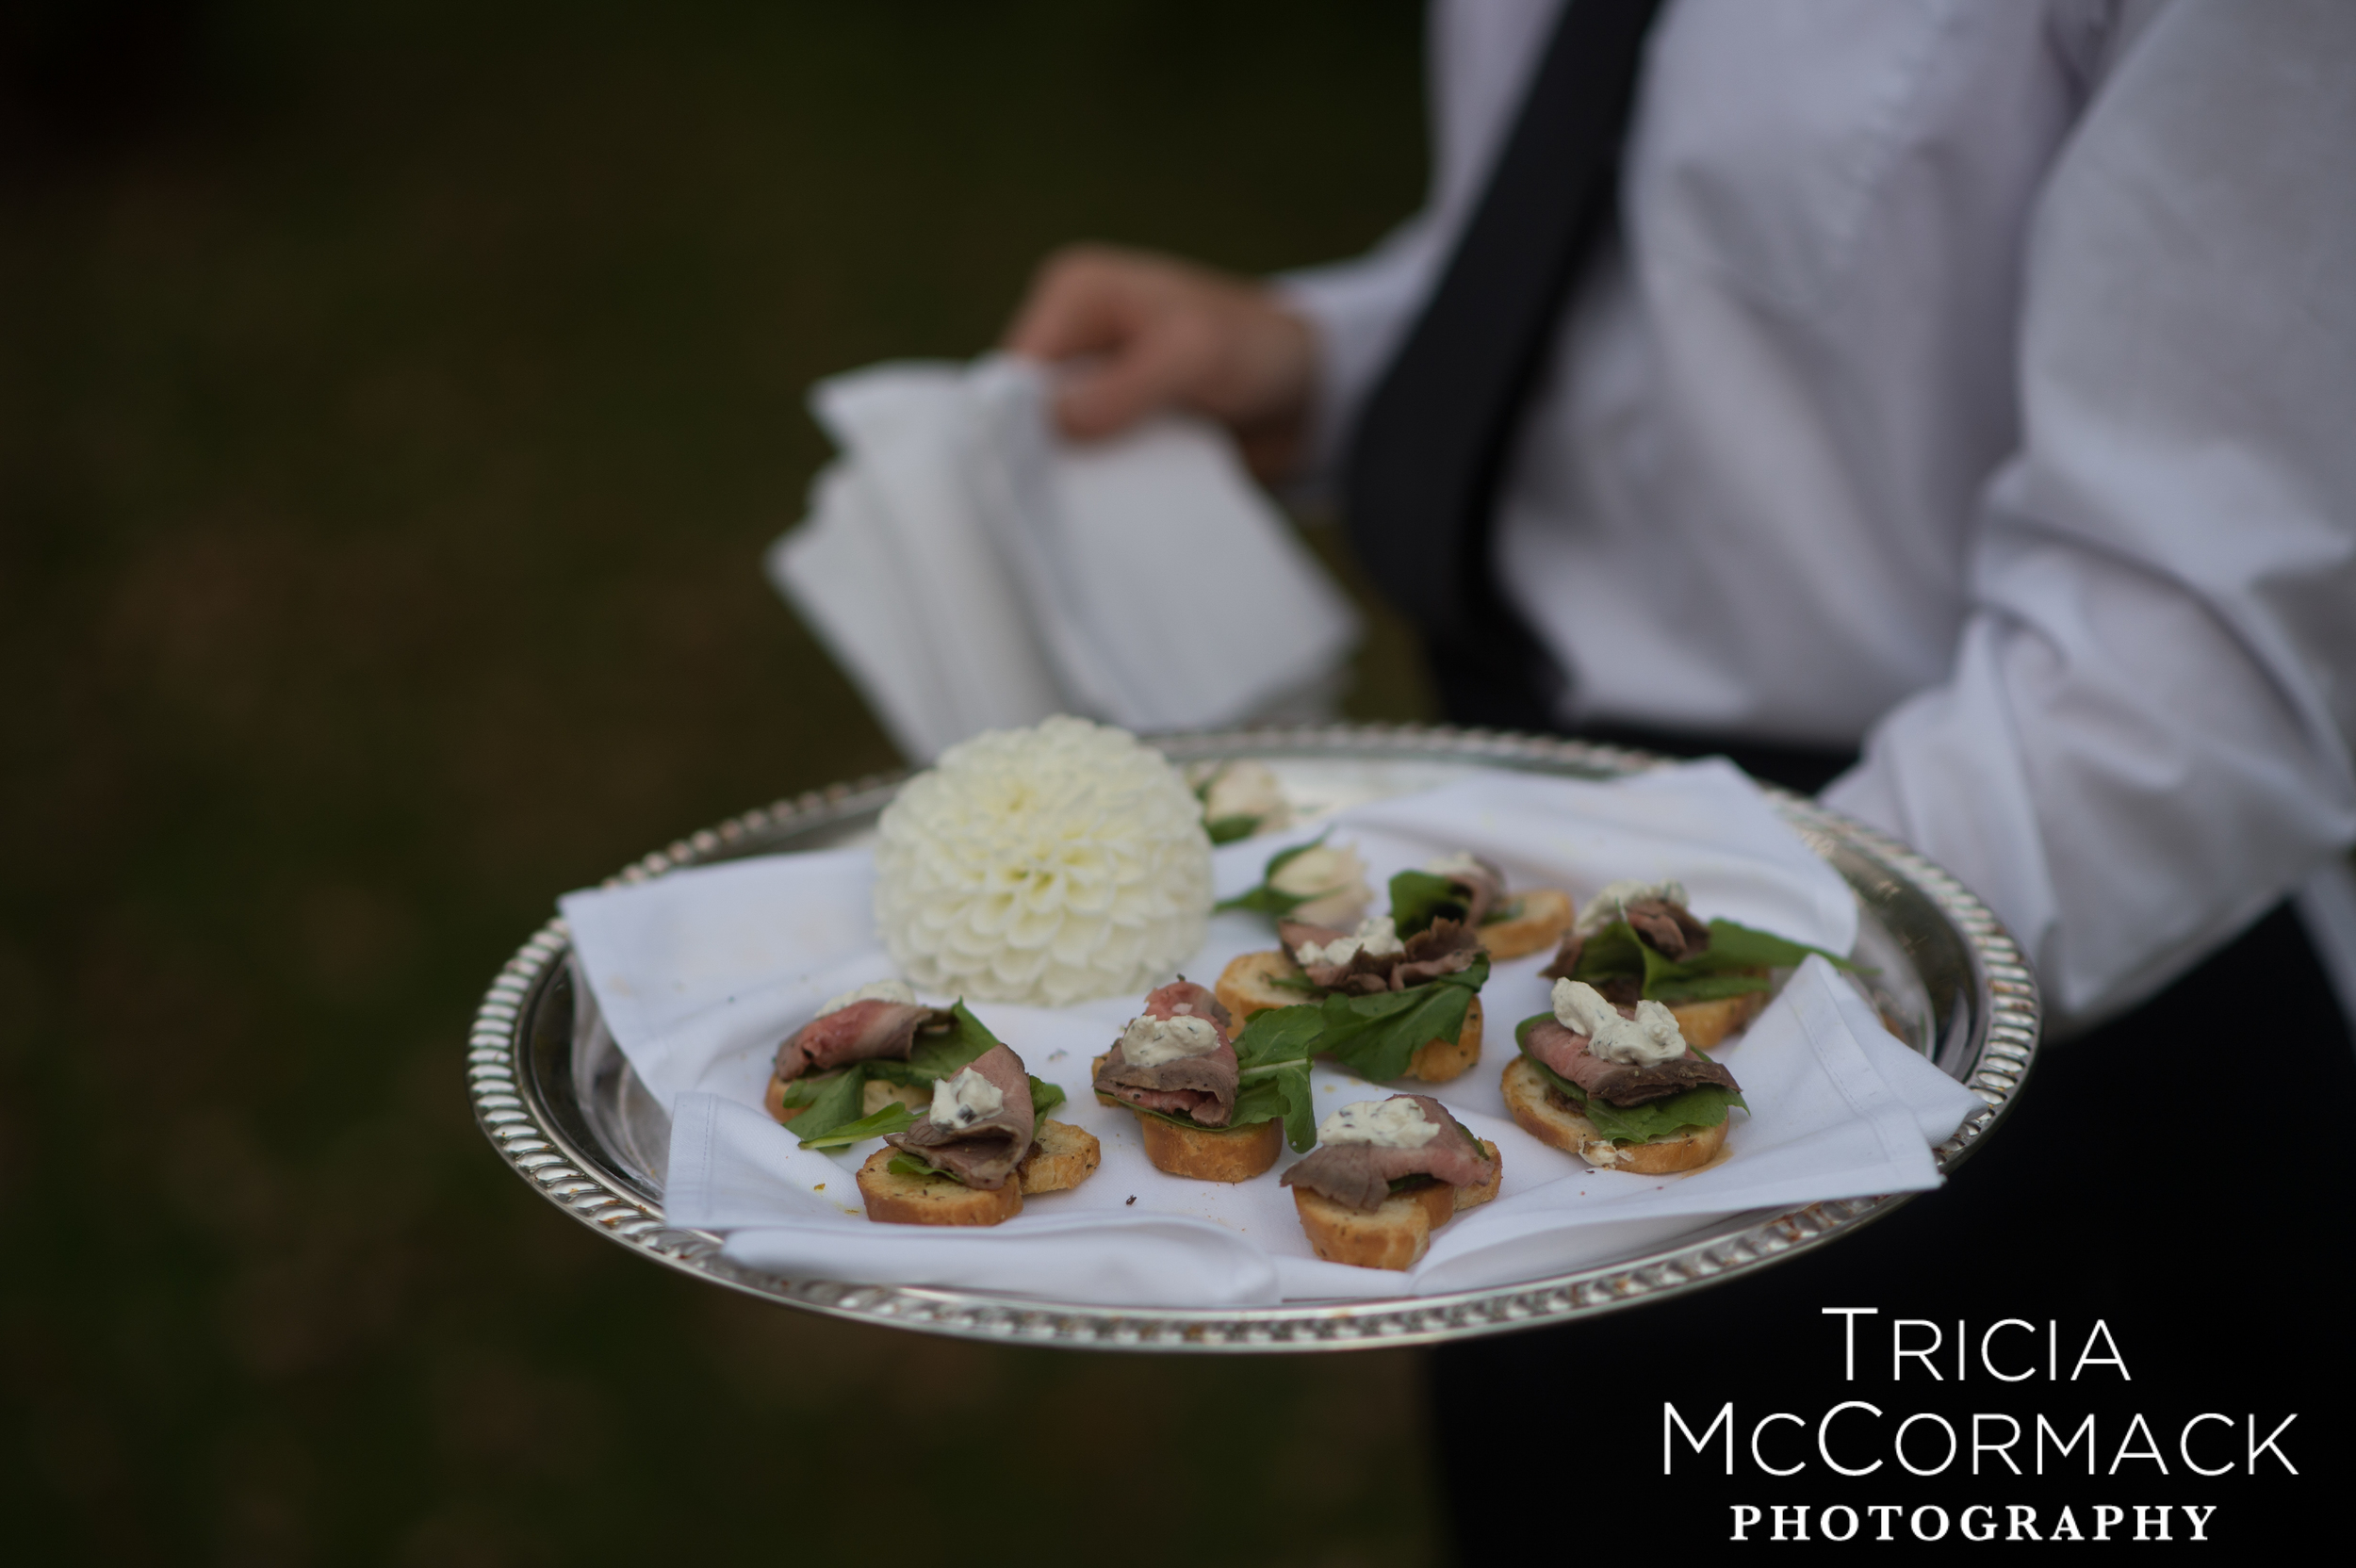 Wedding Catering in the Berkshires  Wedding Caterers in the Berkshires  Lenox MA wedding catering  Lenox MA wedding caterers  western ma catering  Wedding Catering  Wedding Caterers